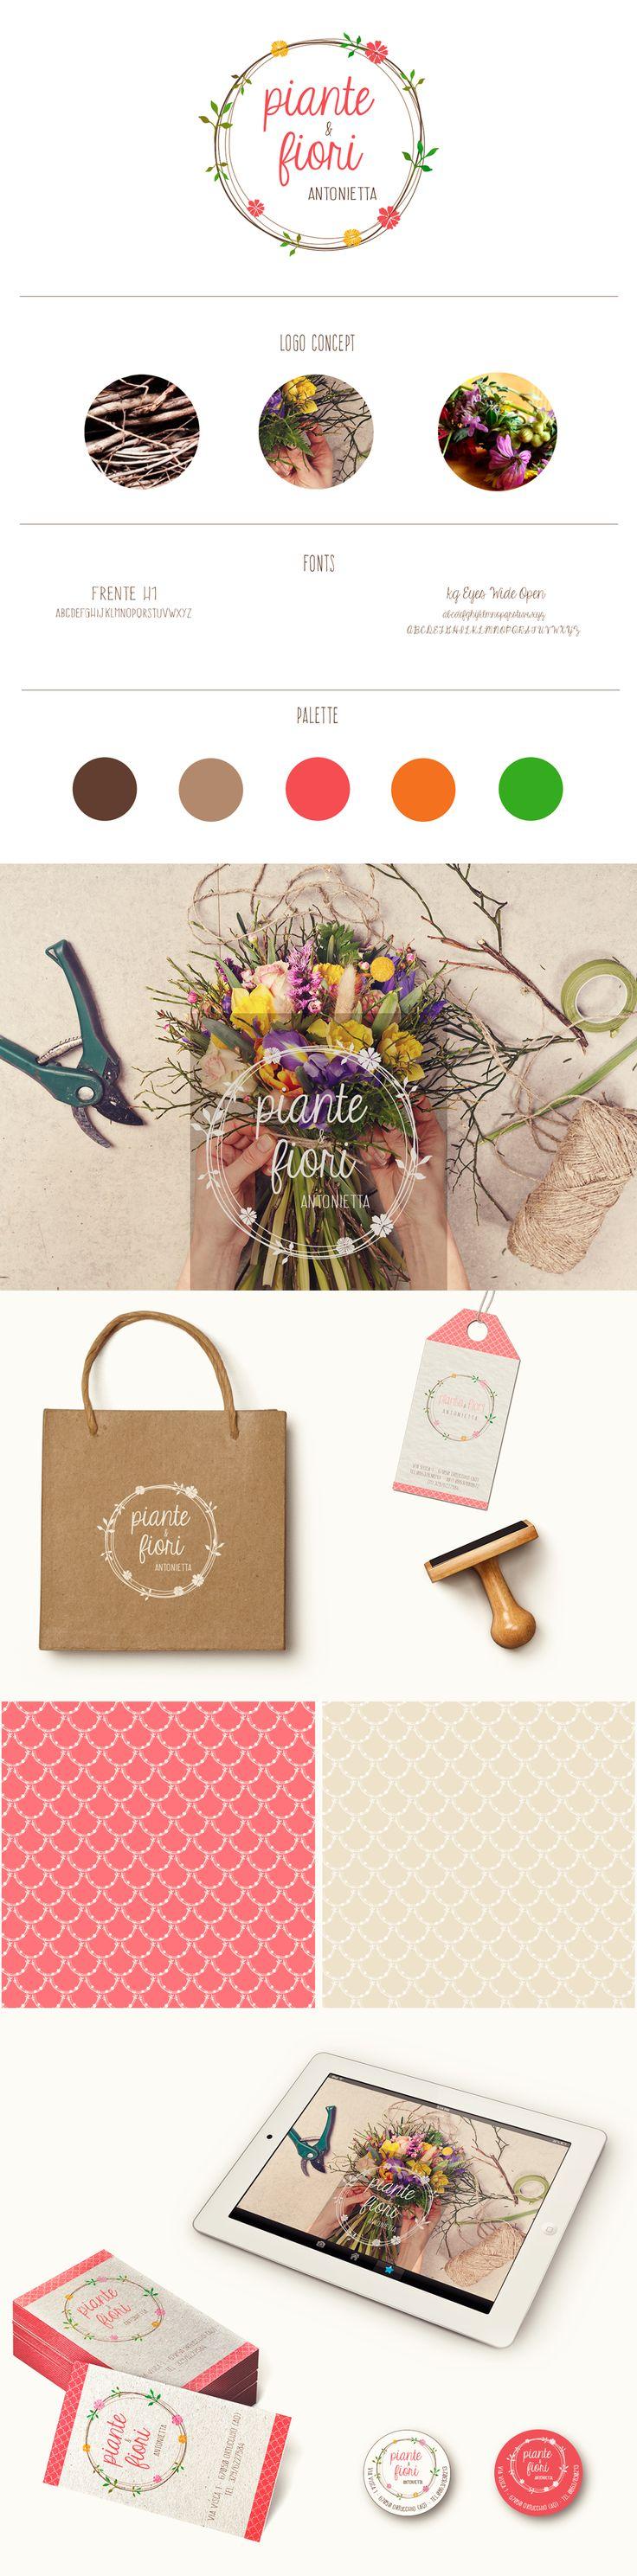 Florist branding. #logo #branding #flowershop